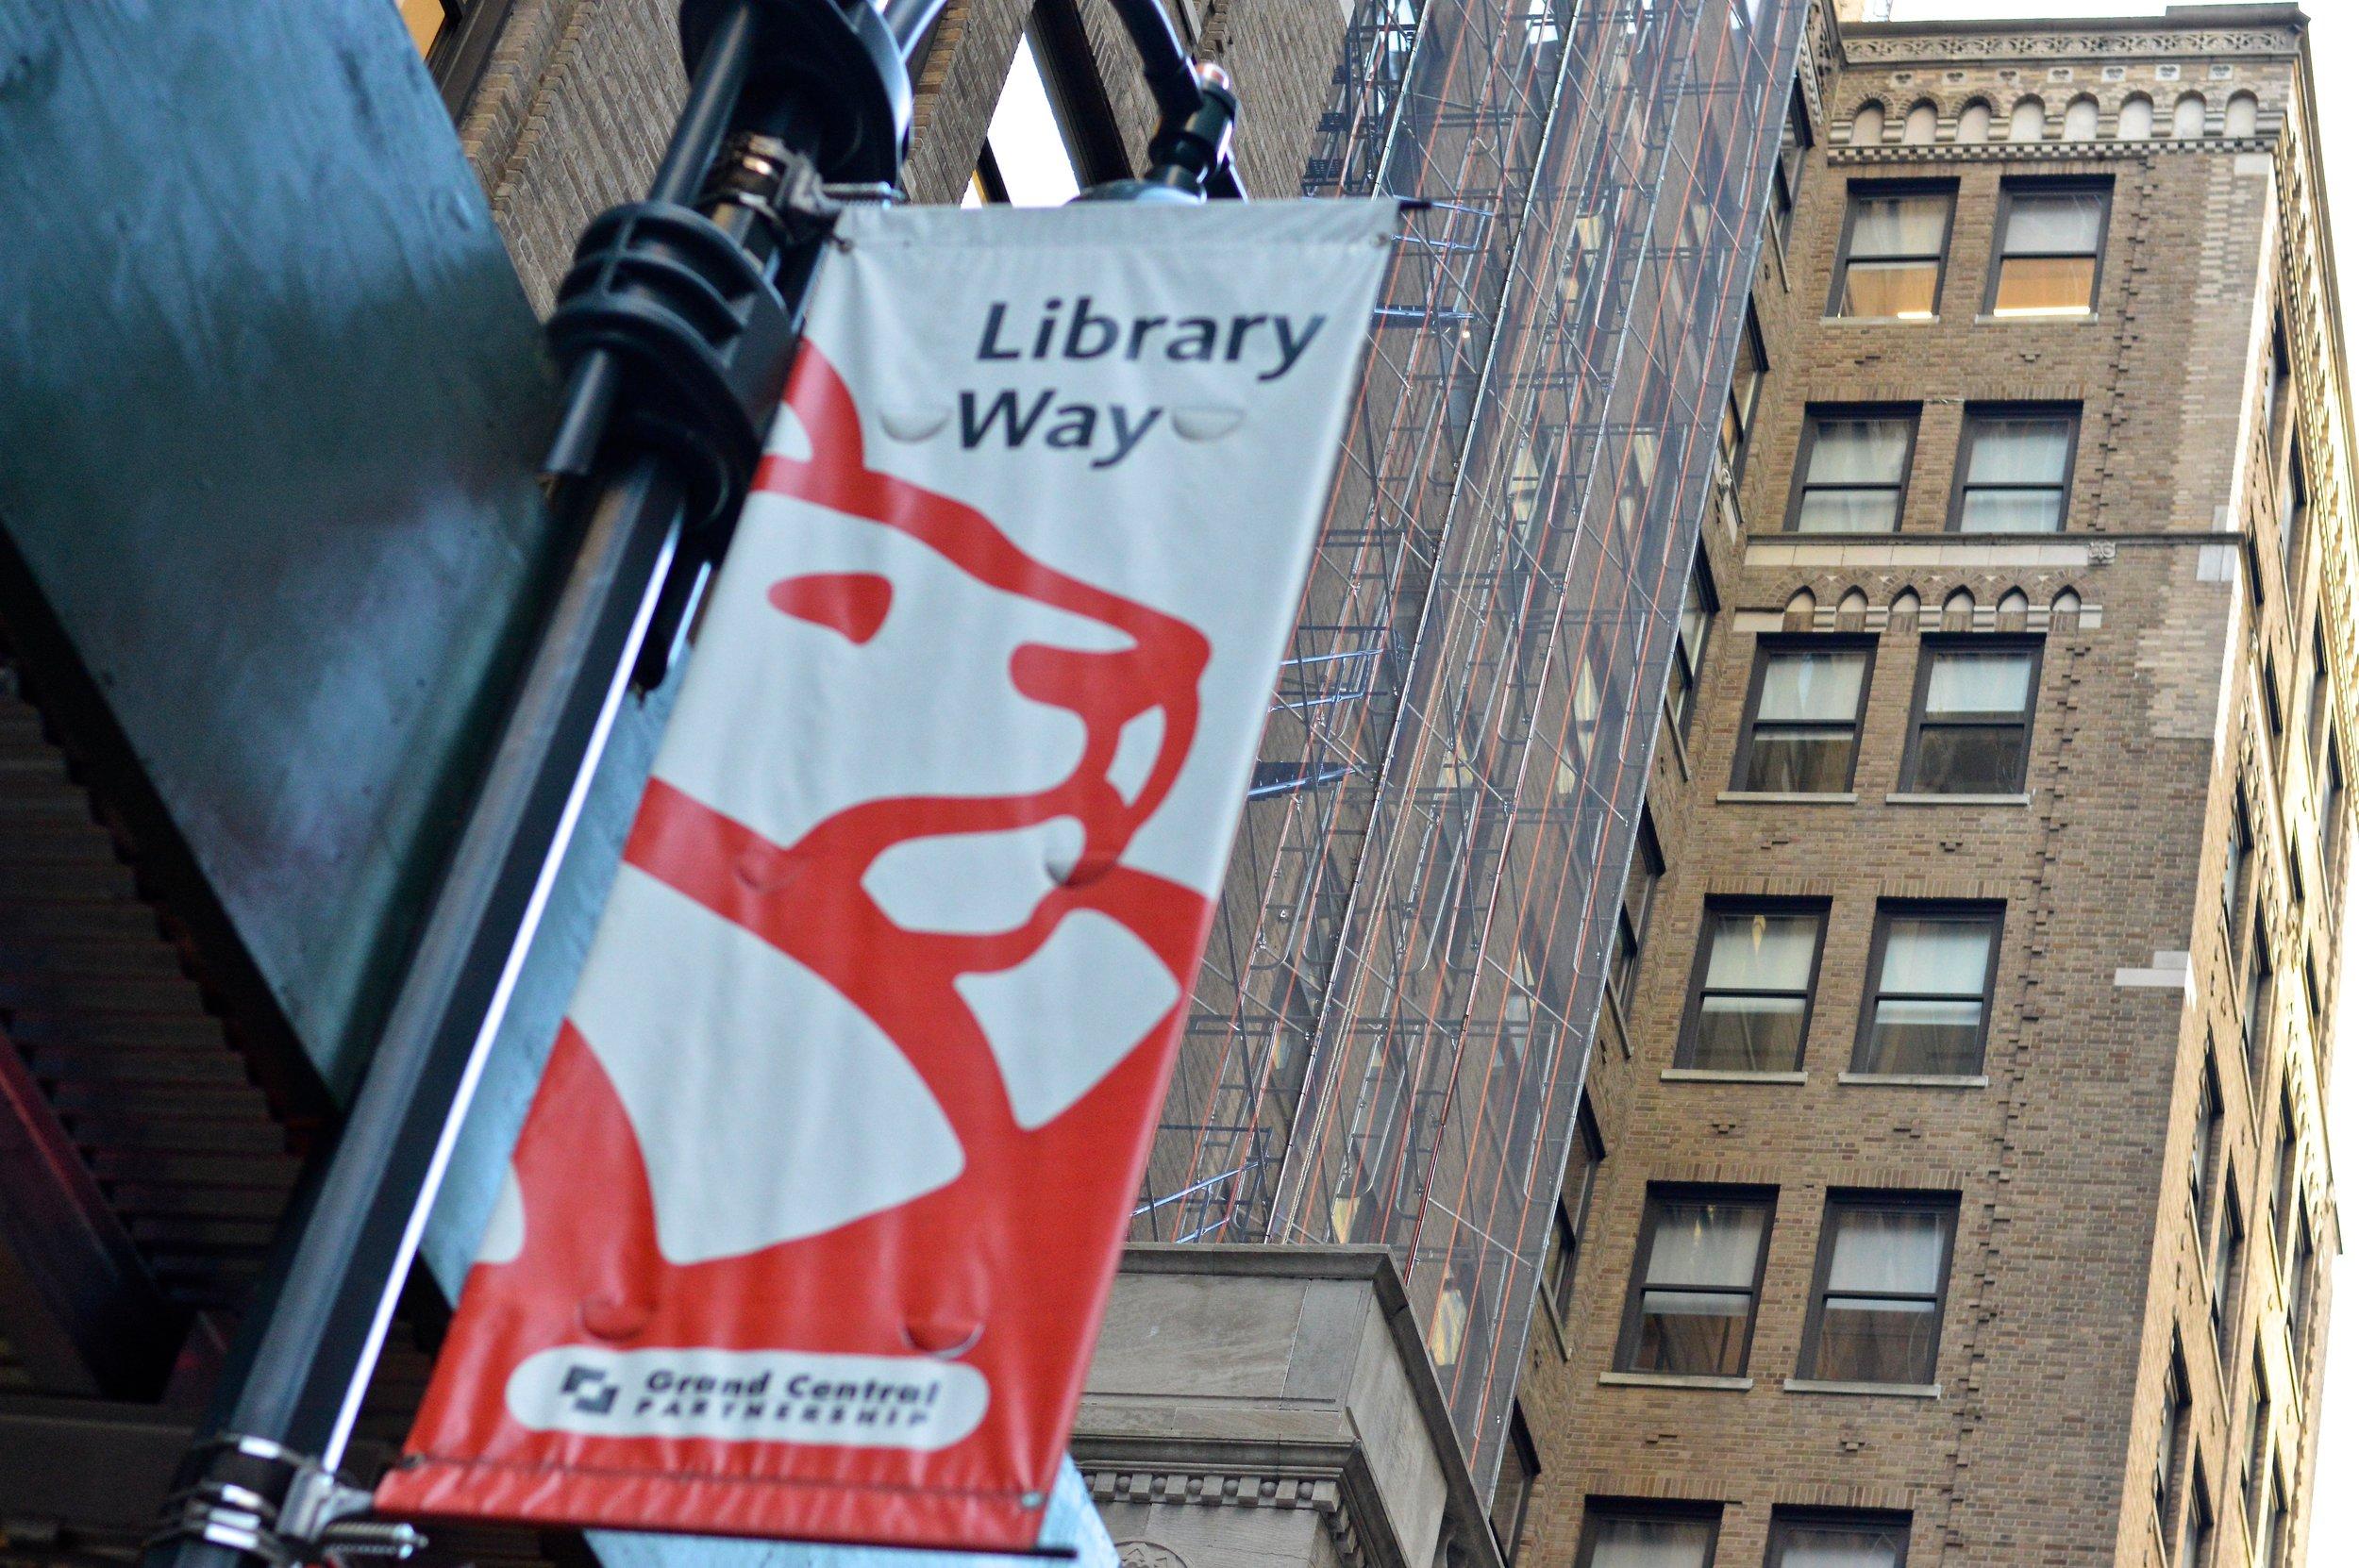 Bryant Park New York Public Library 5.jpg